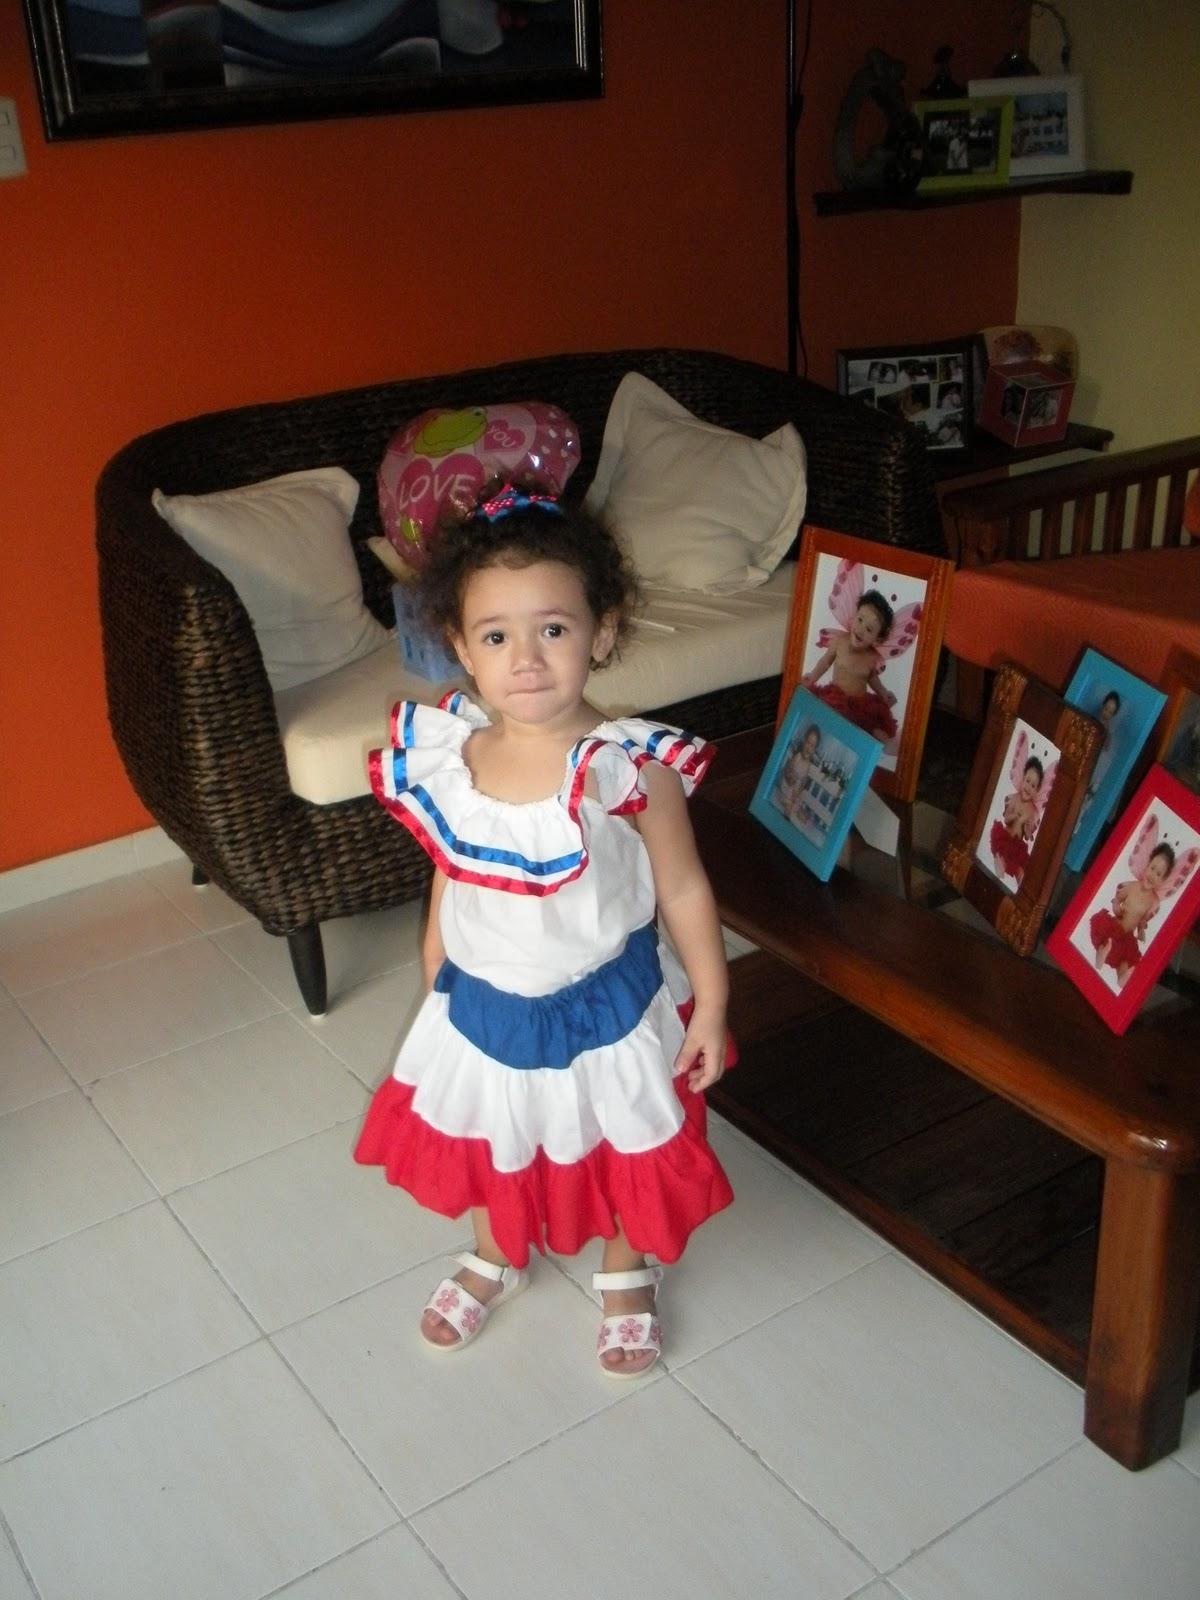 Niño Ropa Tradicional De Republica Dominicana Wwwmiifotoscom